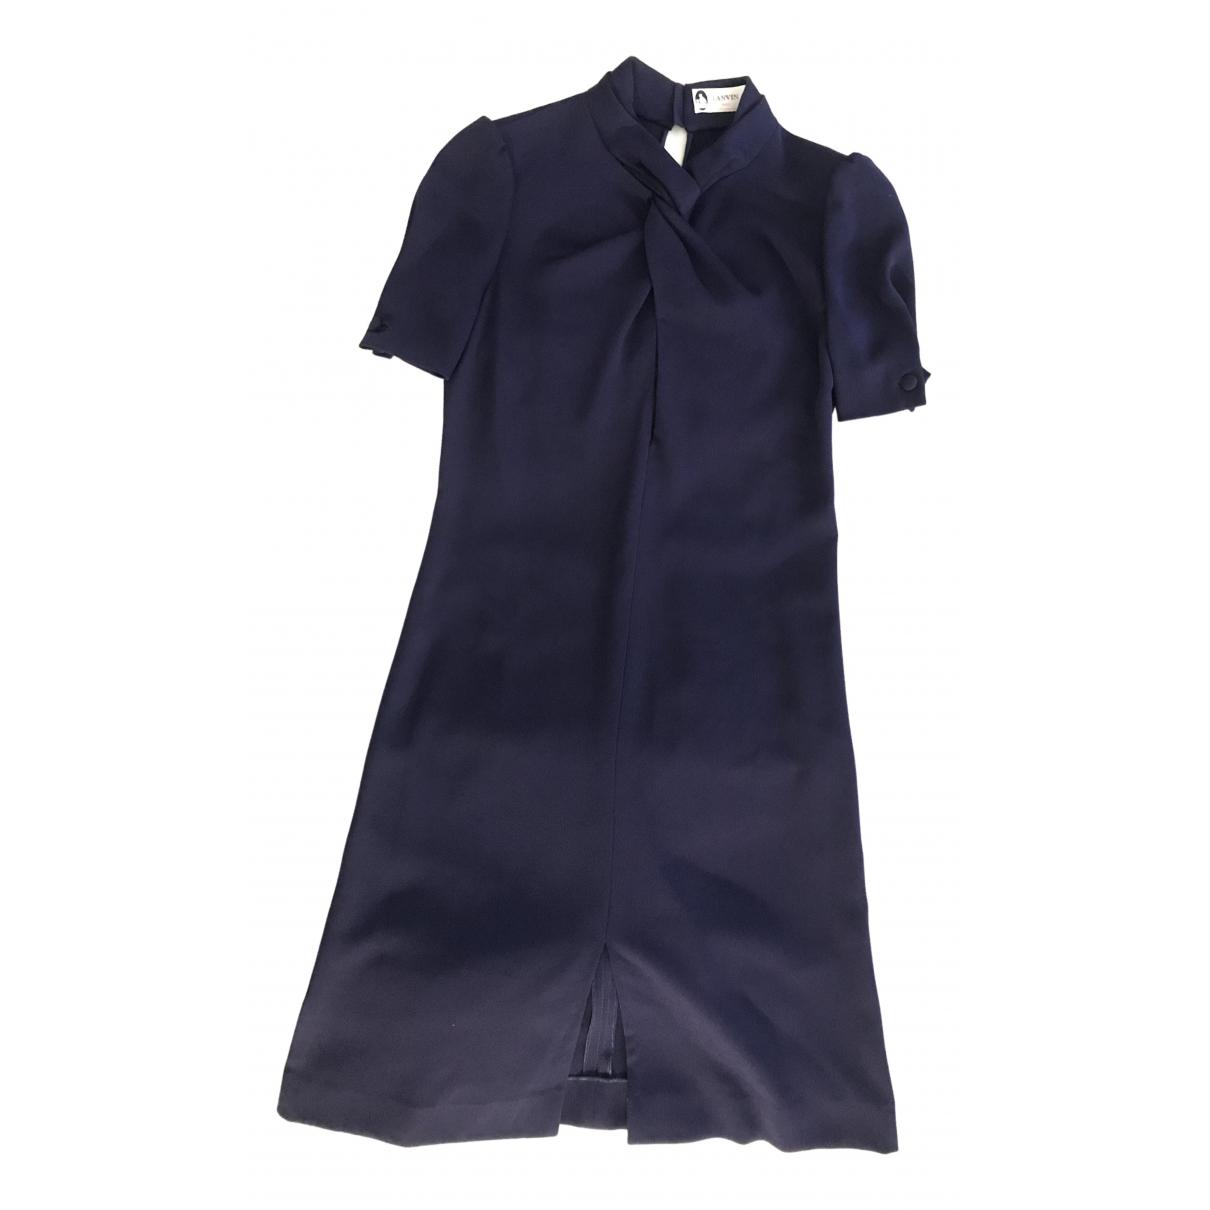 Lanvin N Blue dress for Women 36 FR